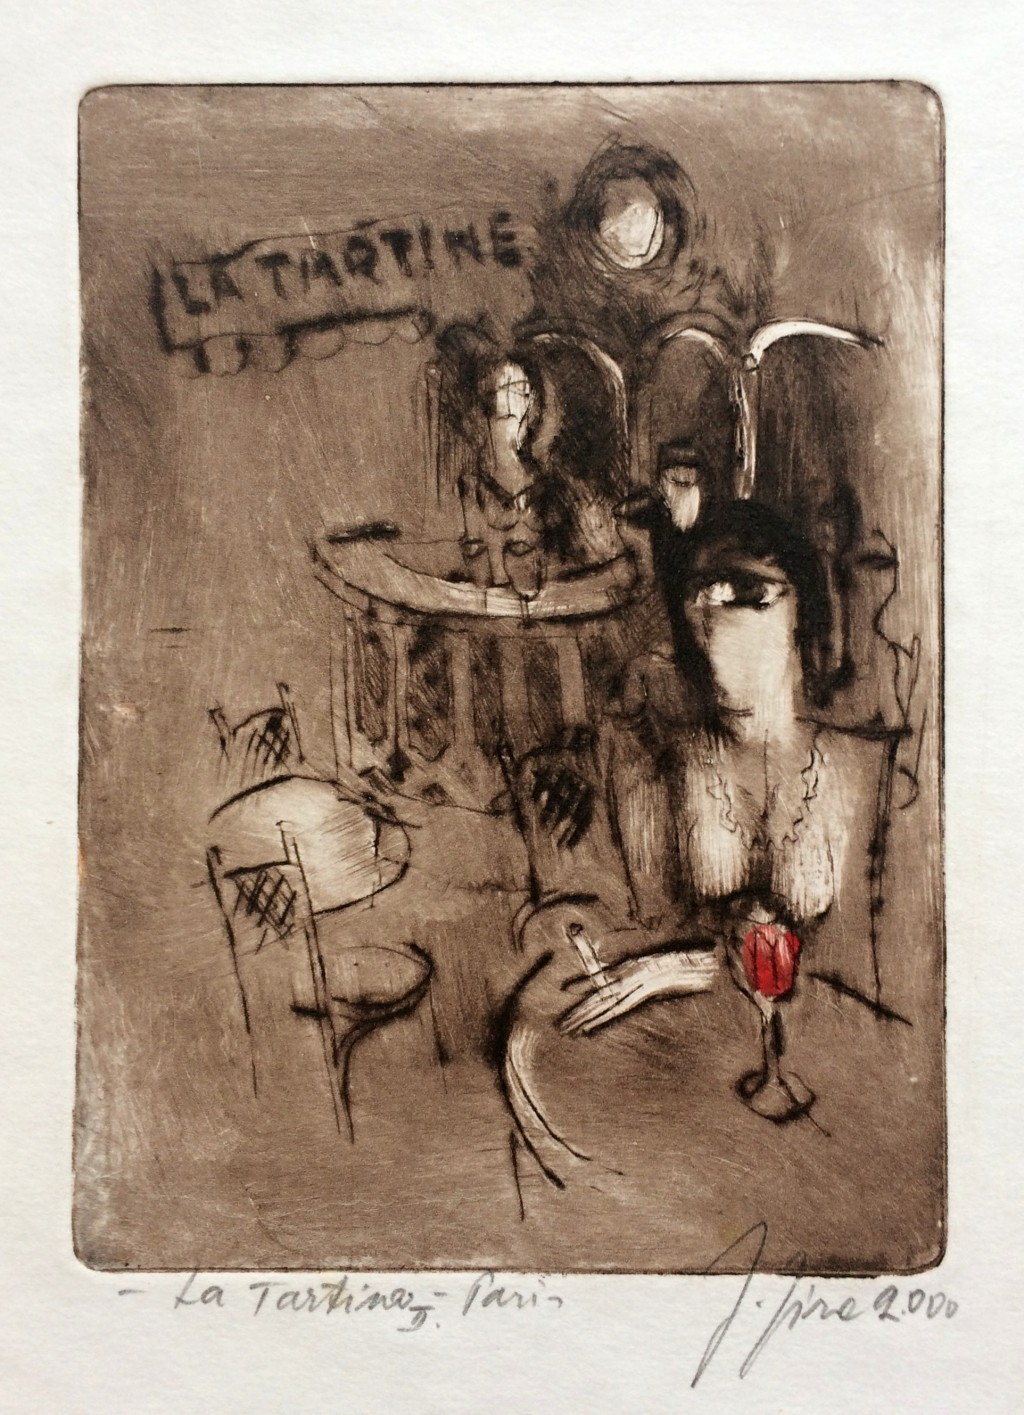 Jíra Josef (1929 - 2005) : La Tartine II - Paris